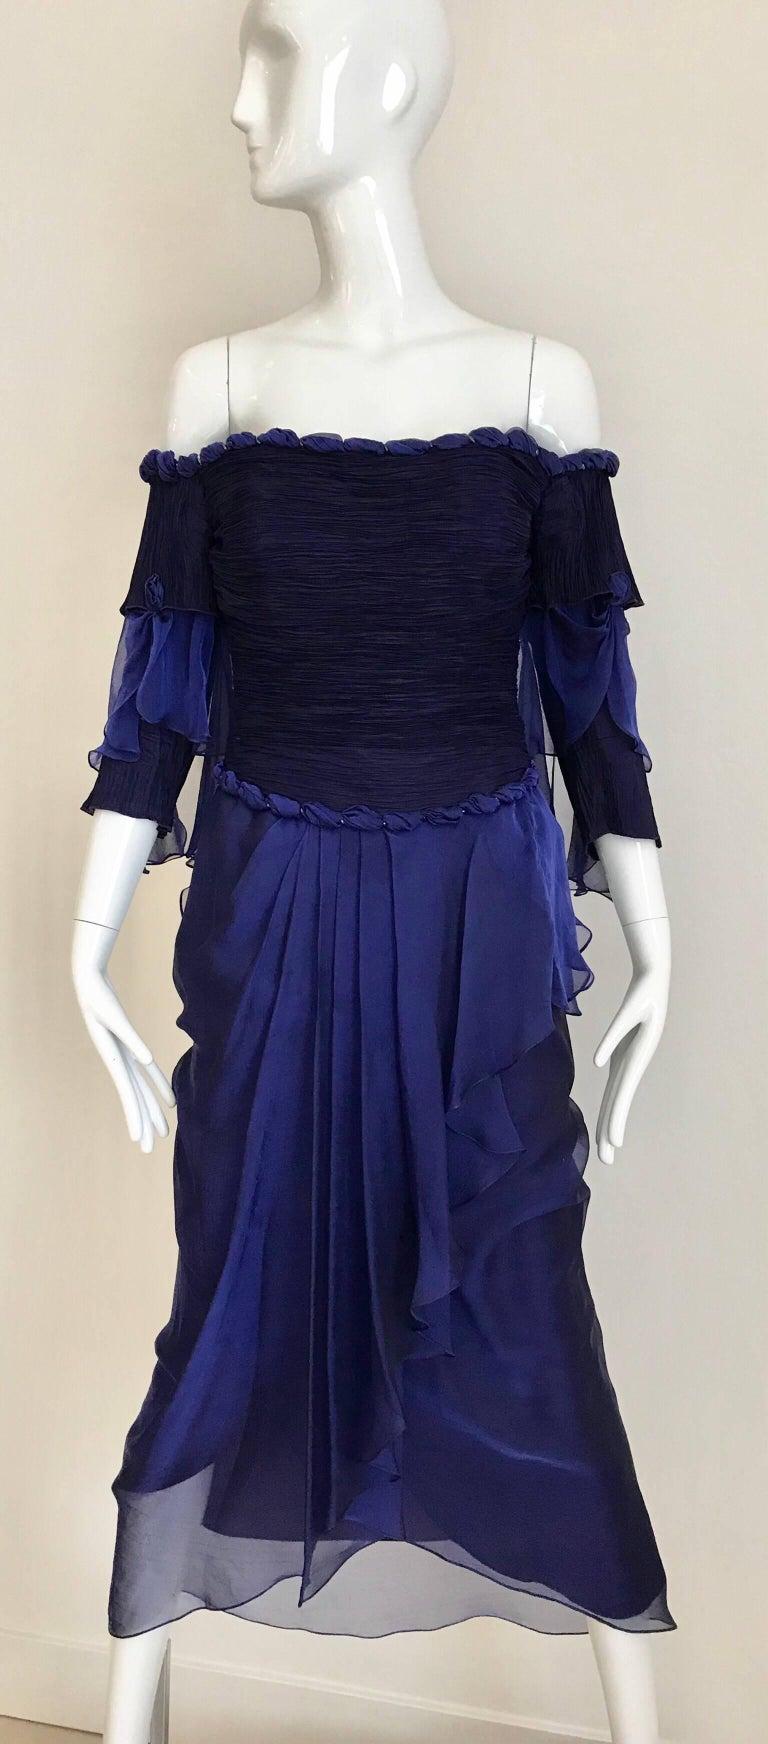 Zandra Rhodes Vintage Purple Blue Off Shoulder Cocktail Silk Dress For Sale 6